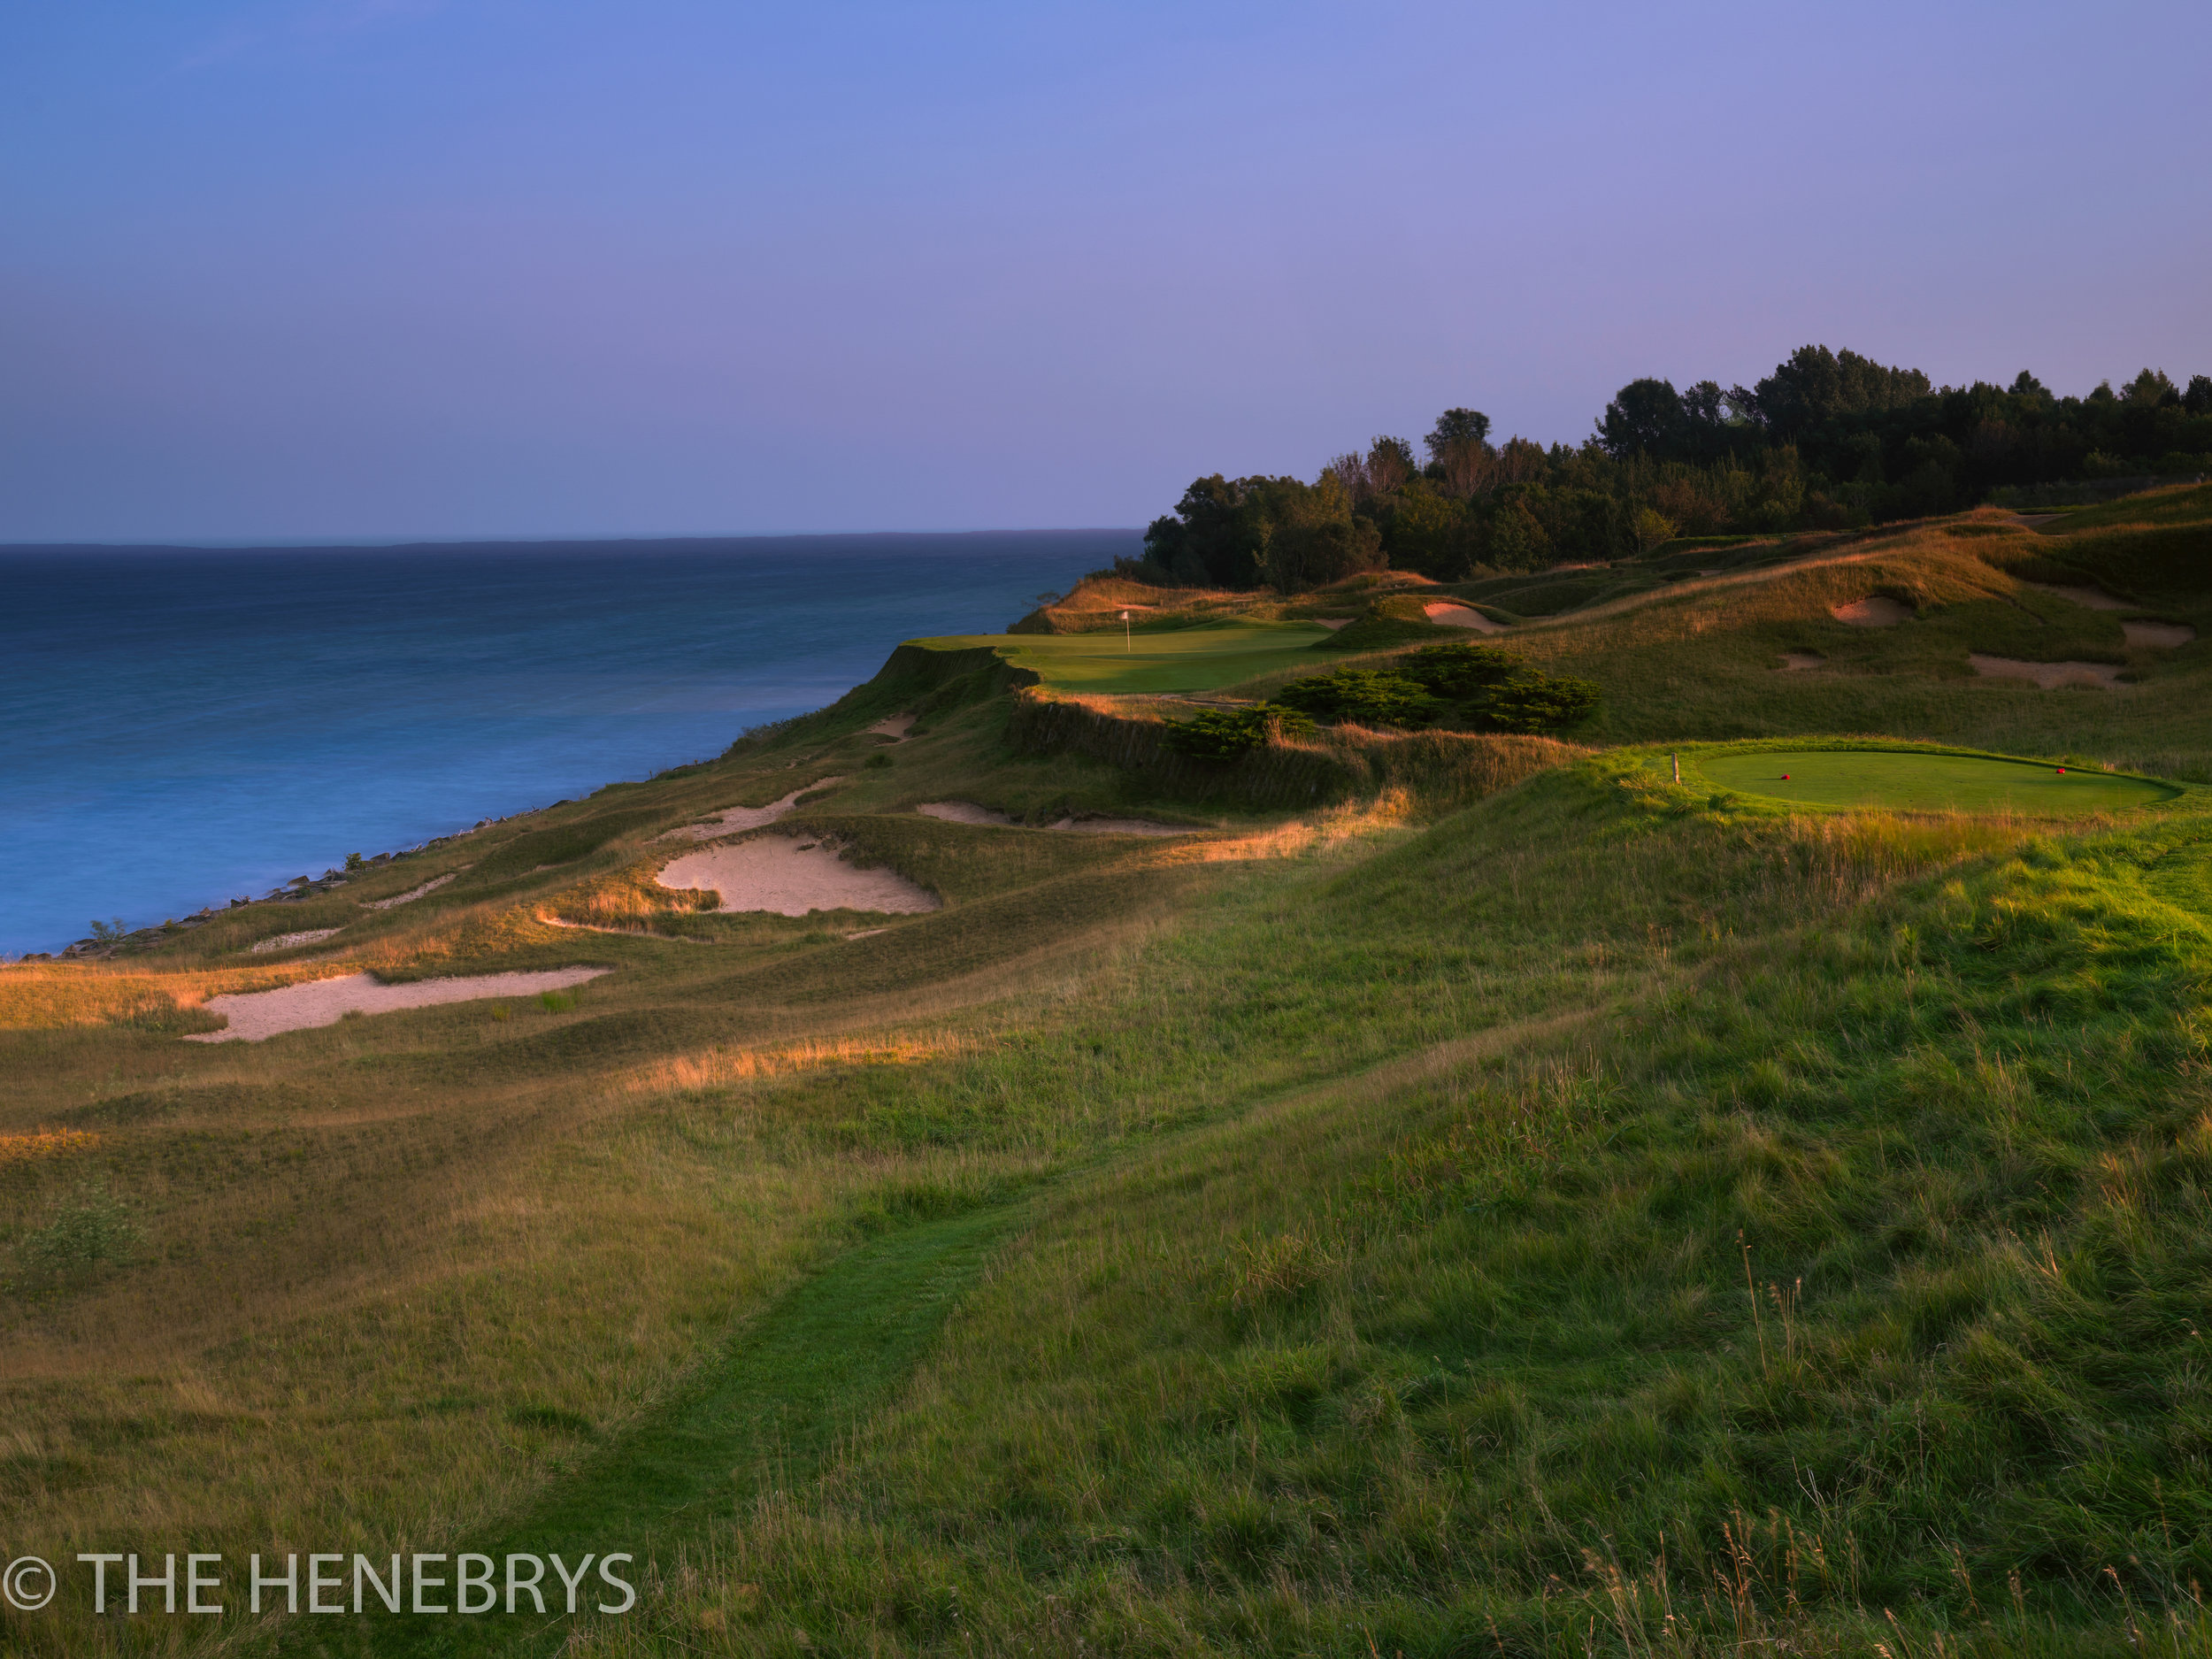 Whistling Straits, Straits Course #17, Kohler, Wisconsin